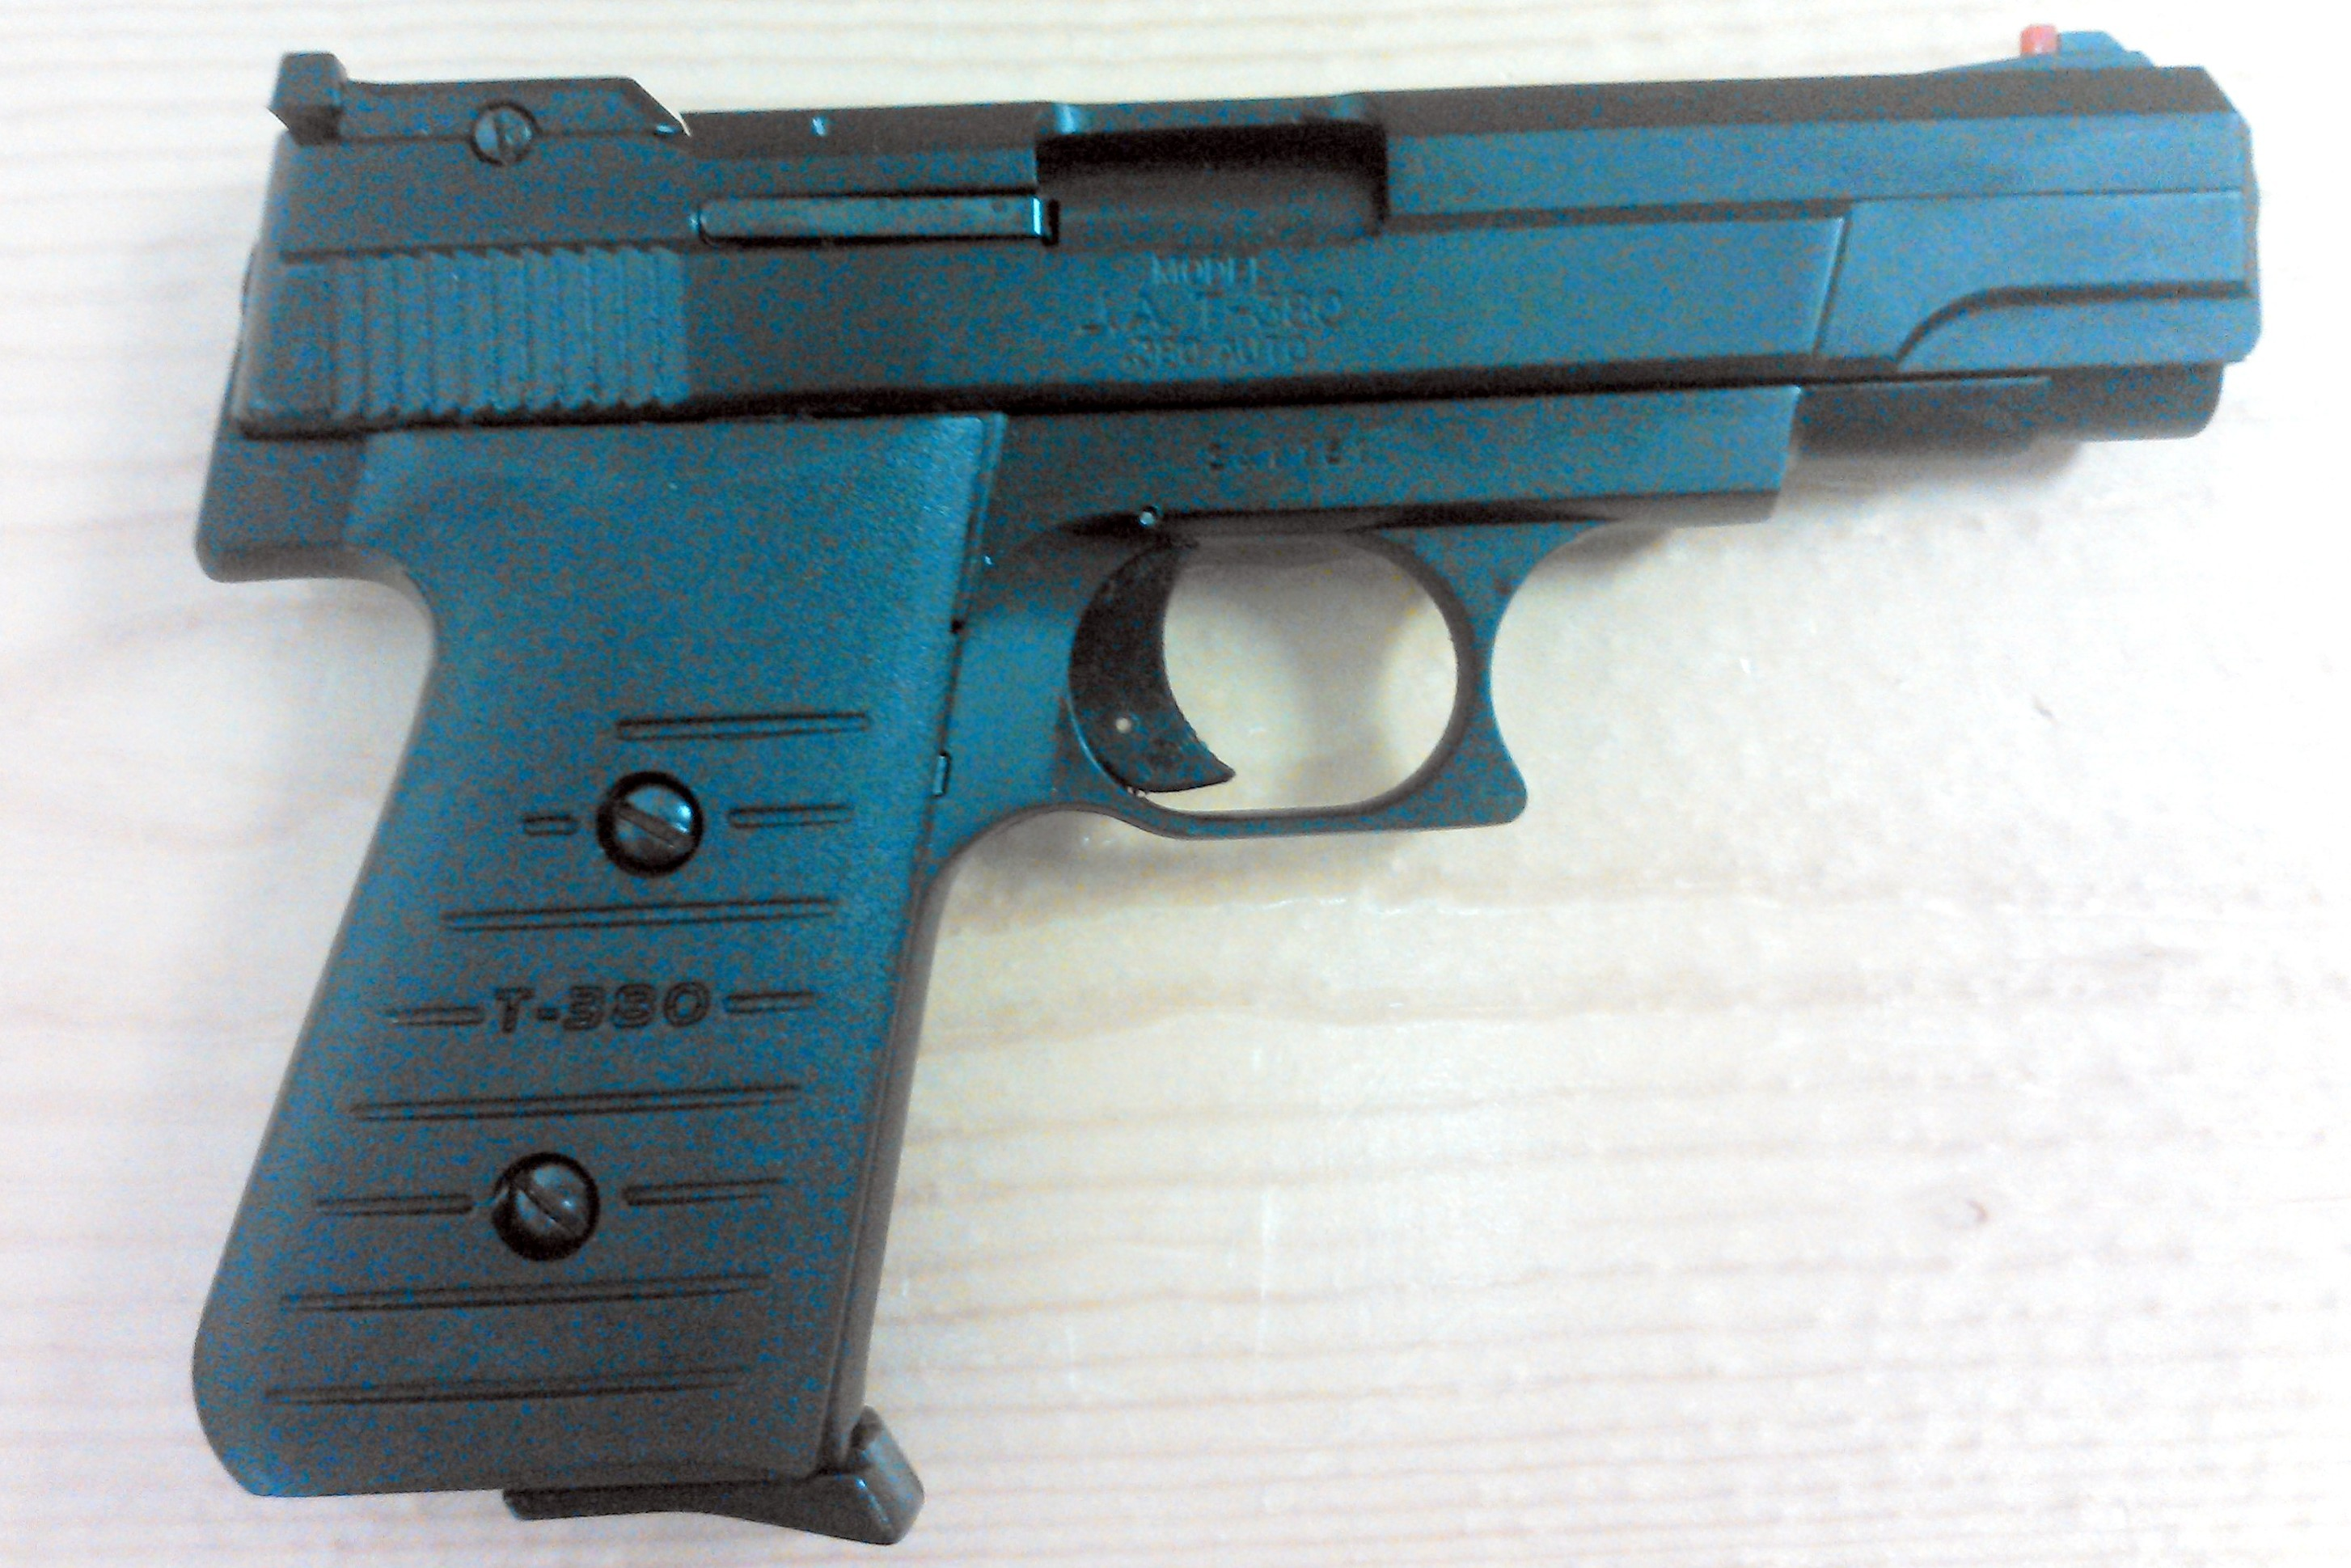 Brand New All Black Jimenez Arms Target-380 Semi Auto Pistol